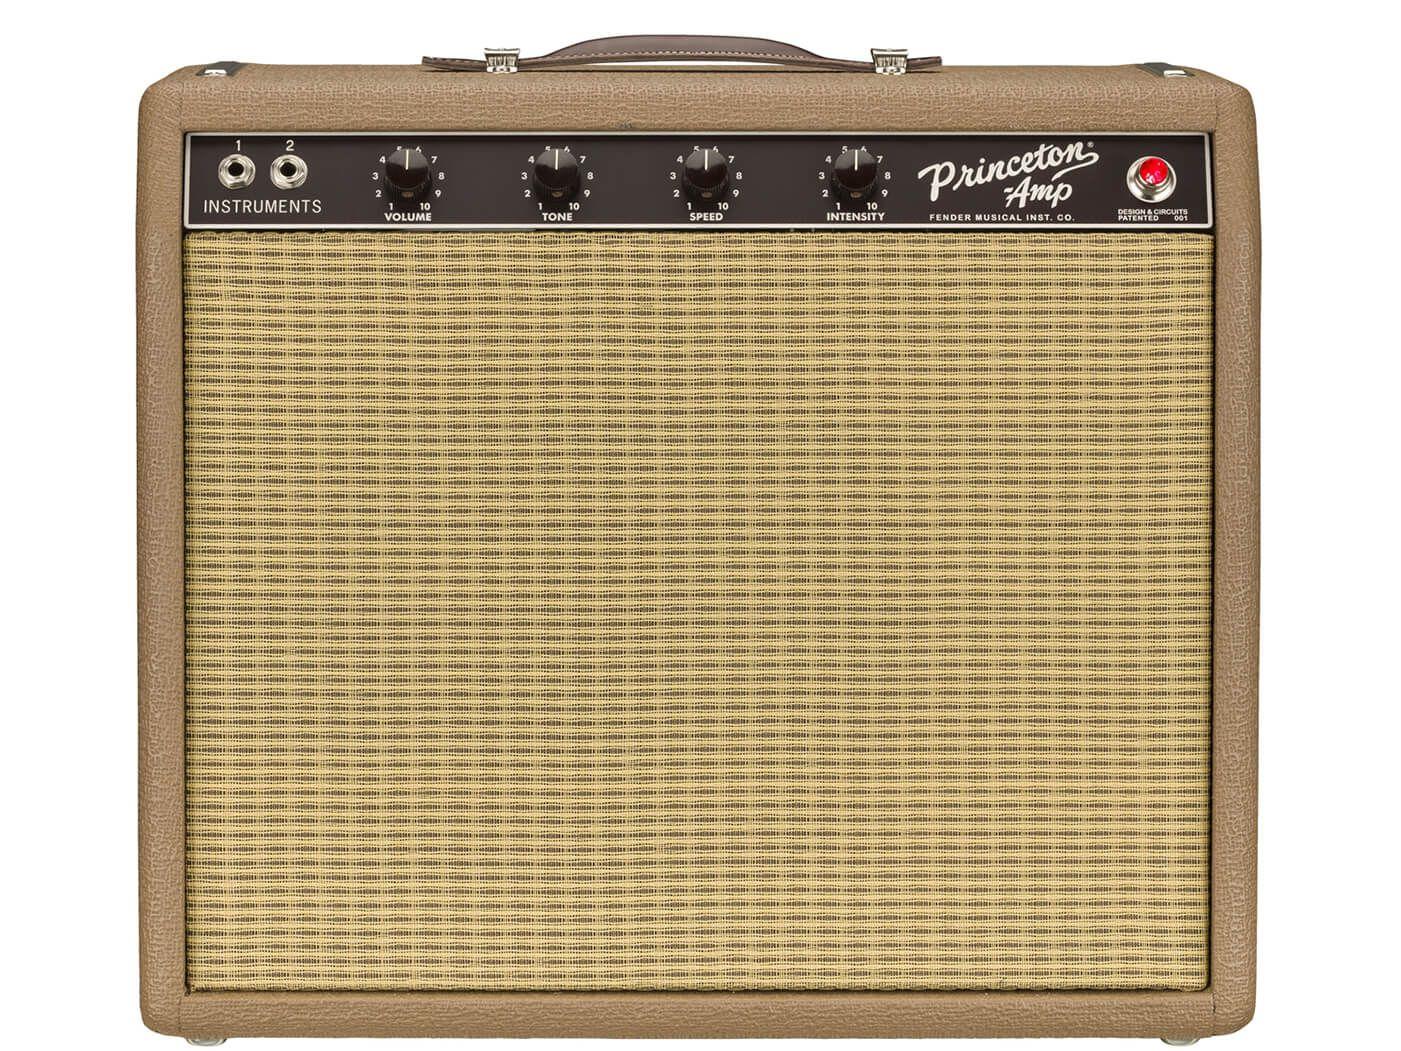 Fender releases 62 princeton chris stapleton signature